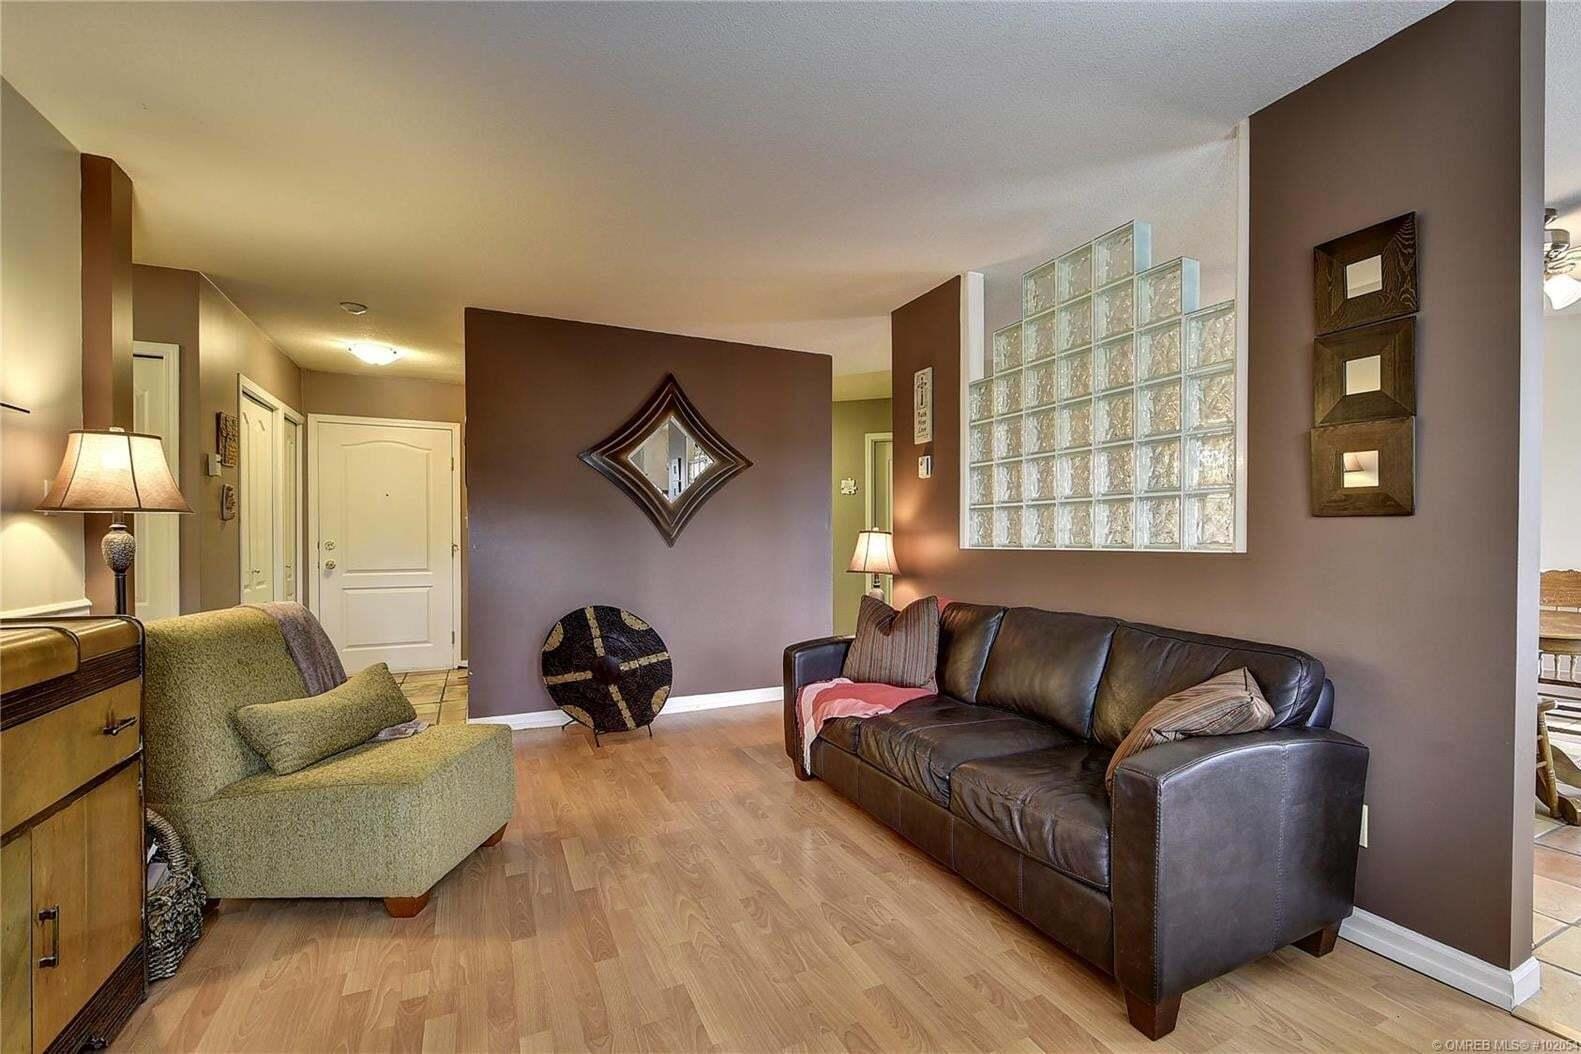 Condo for sale at 769 Klo Rd Unit 220 Kelowna British Columbia - MLS: 10205499